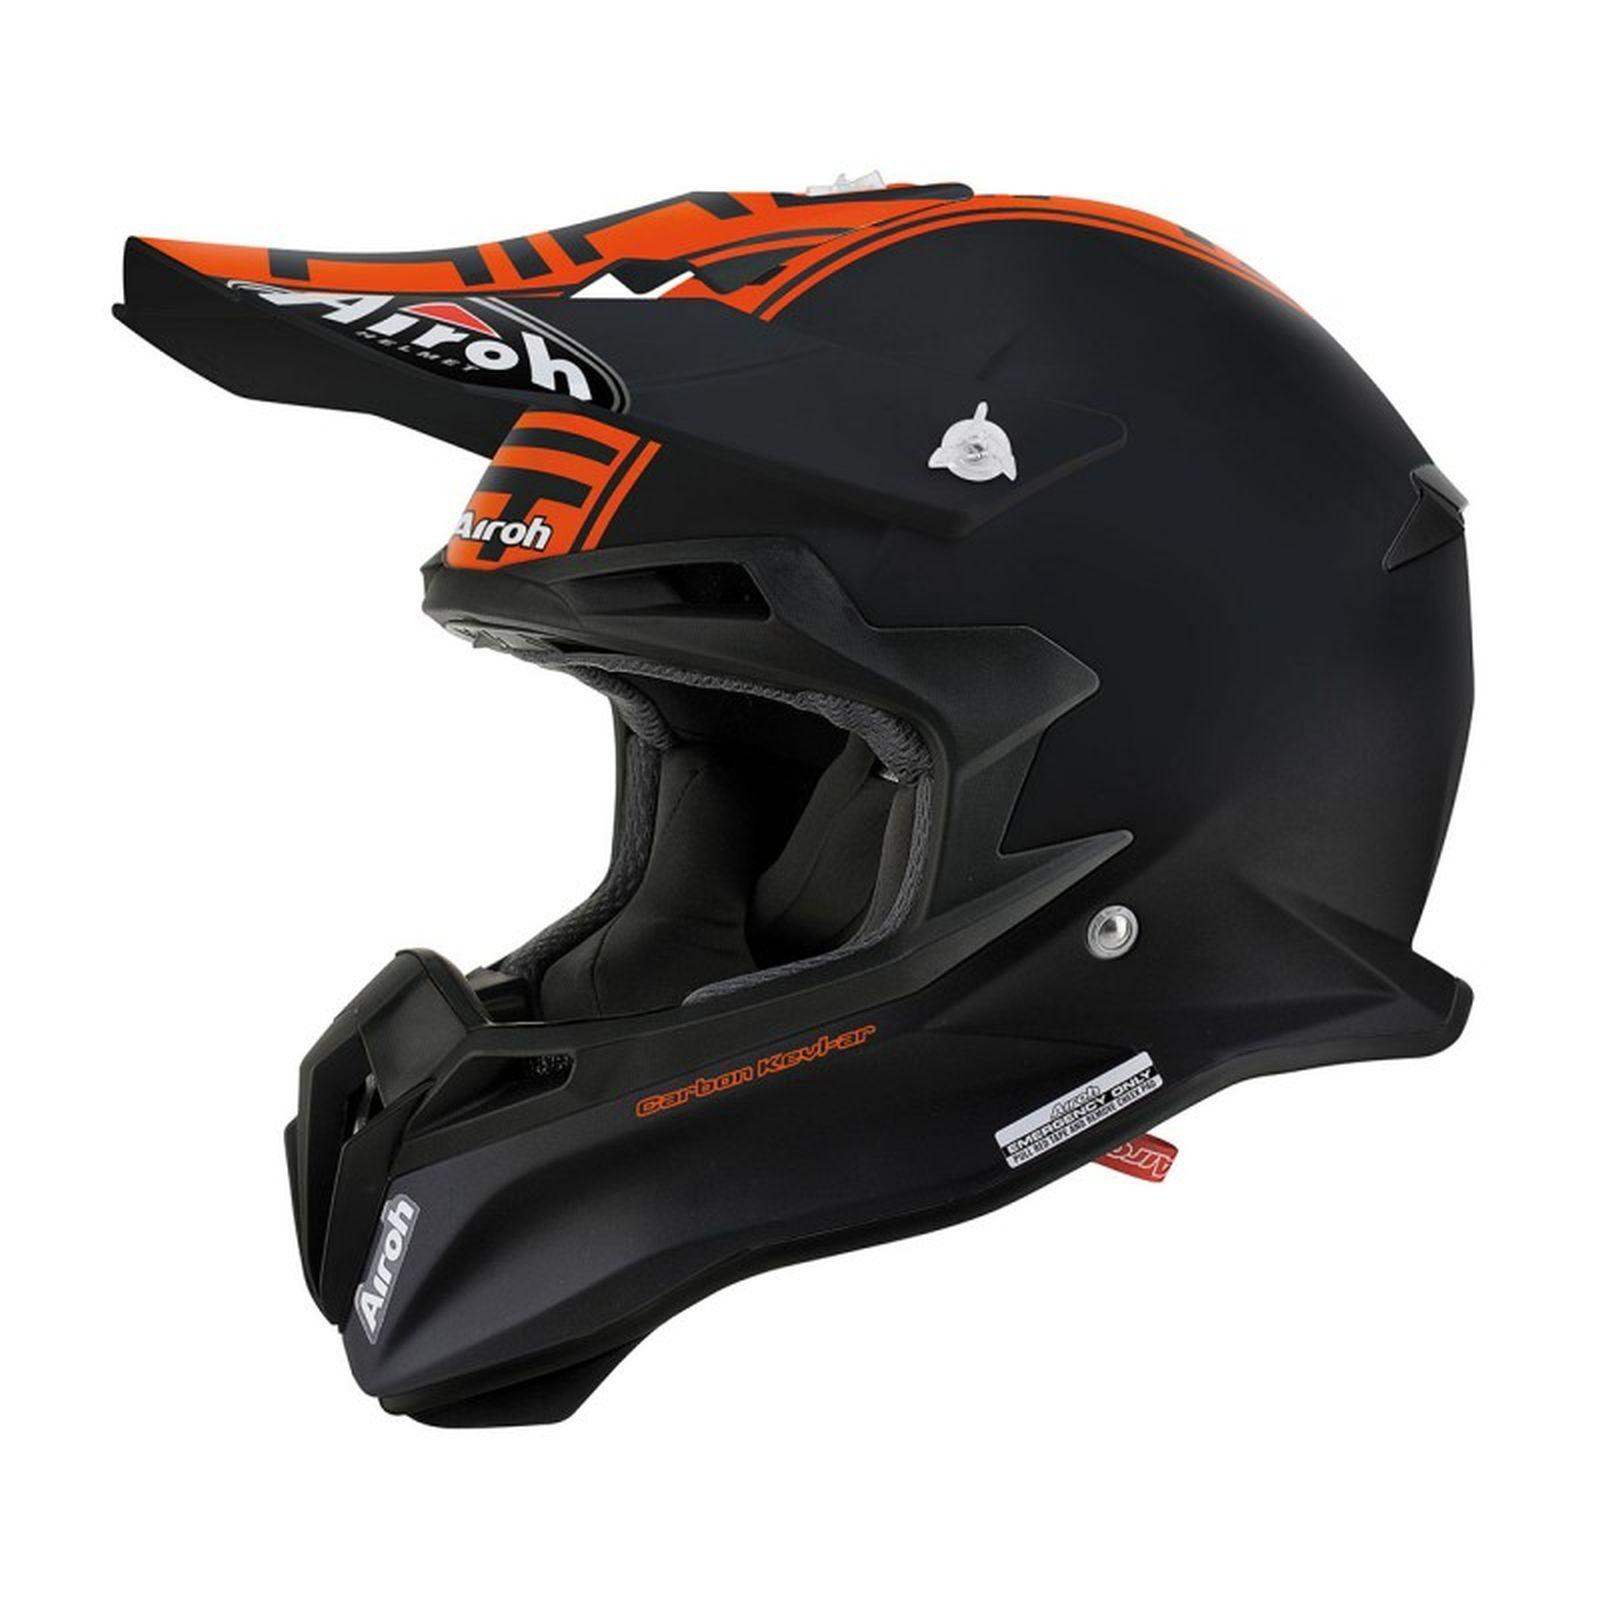 casco moto cross enduro airoh terminator 2 1 in fibra nero opaco arancio ebay. Black Bedroom Furniture Sets. Home Design Ideas